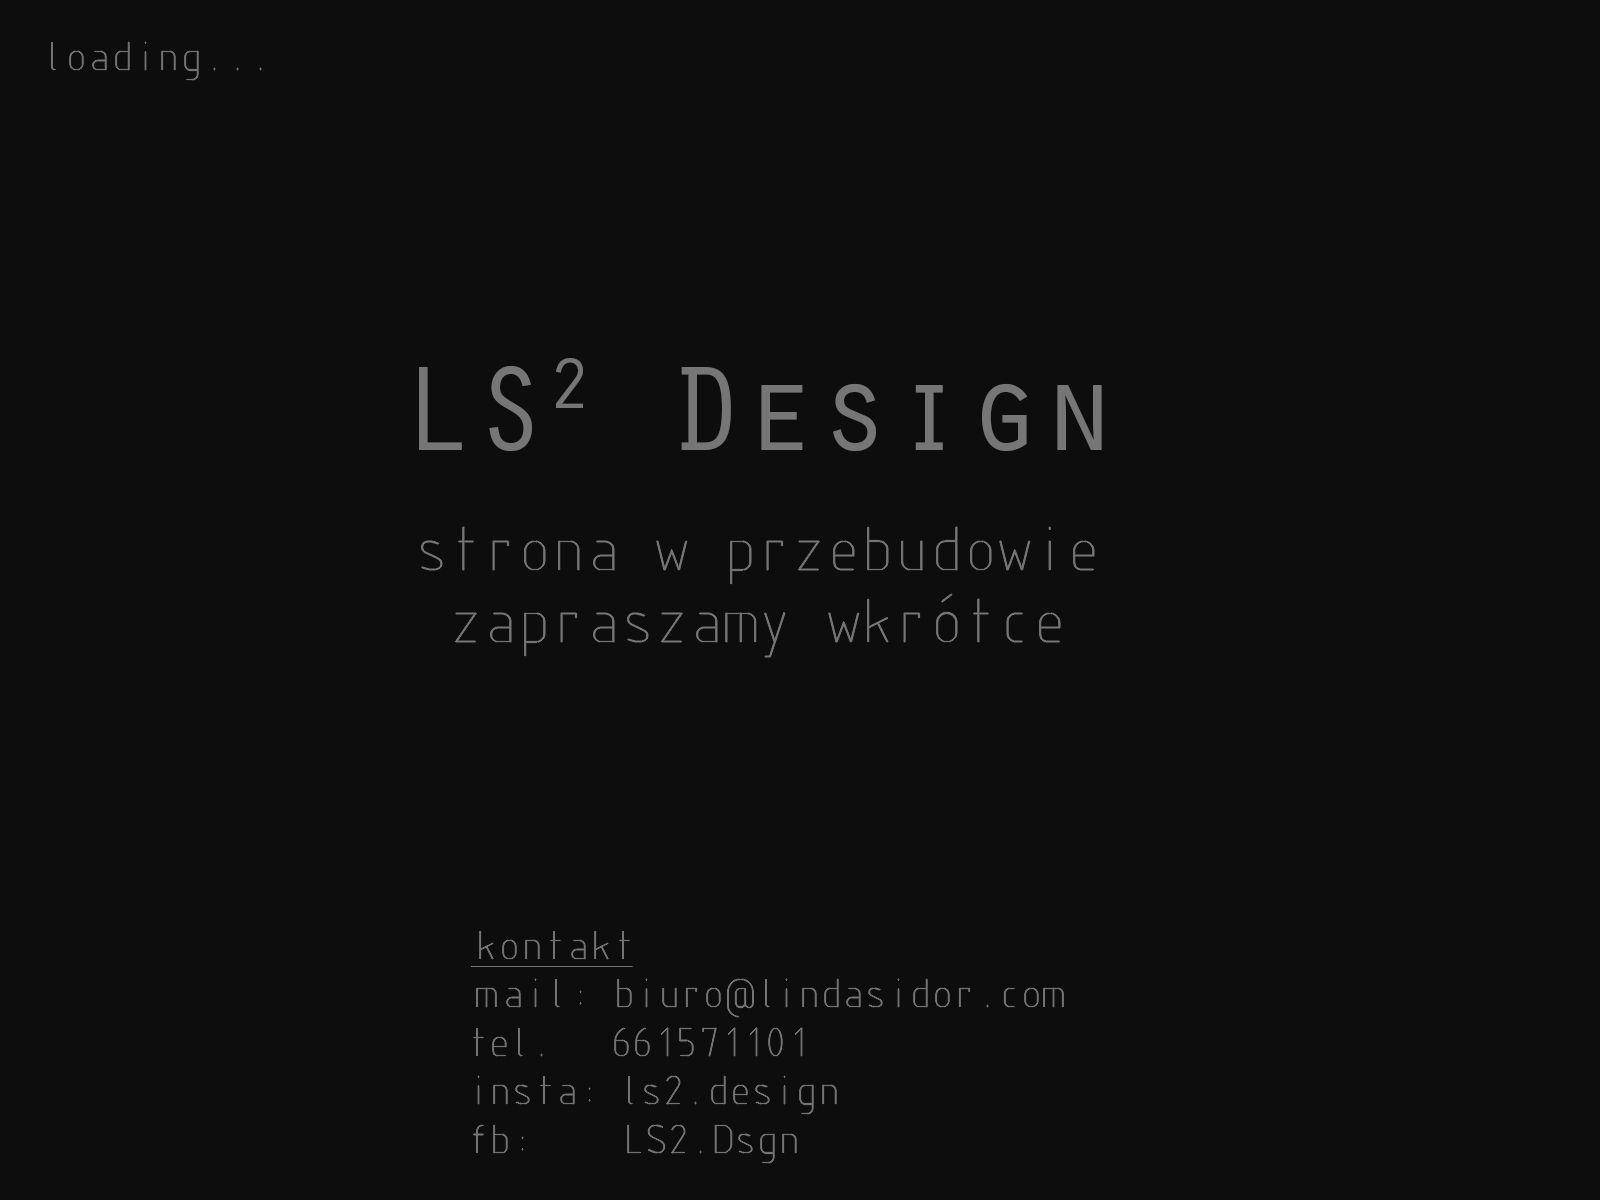 lindasidor.com